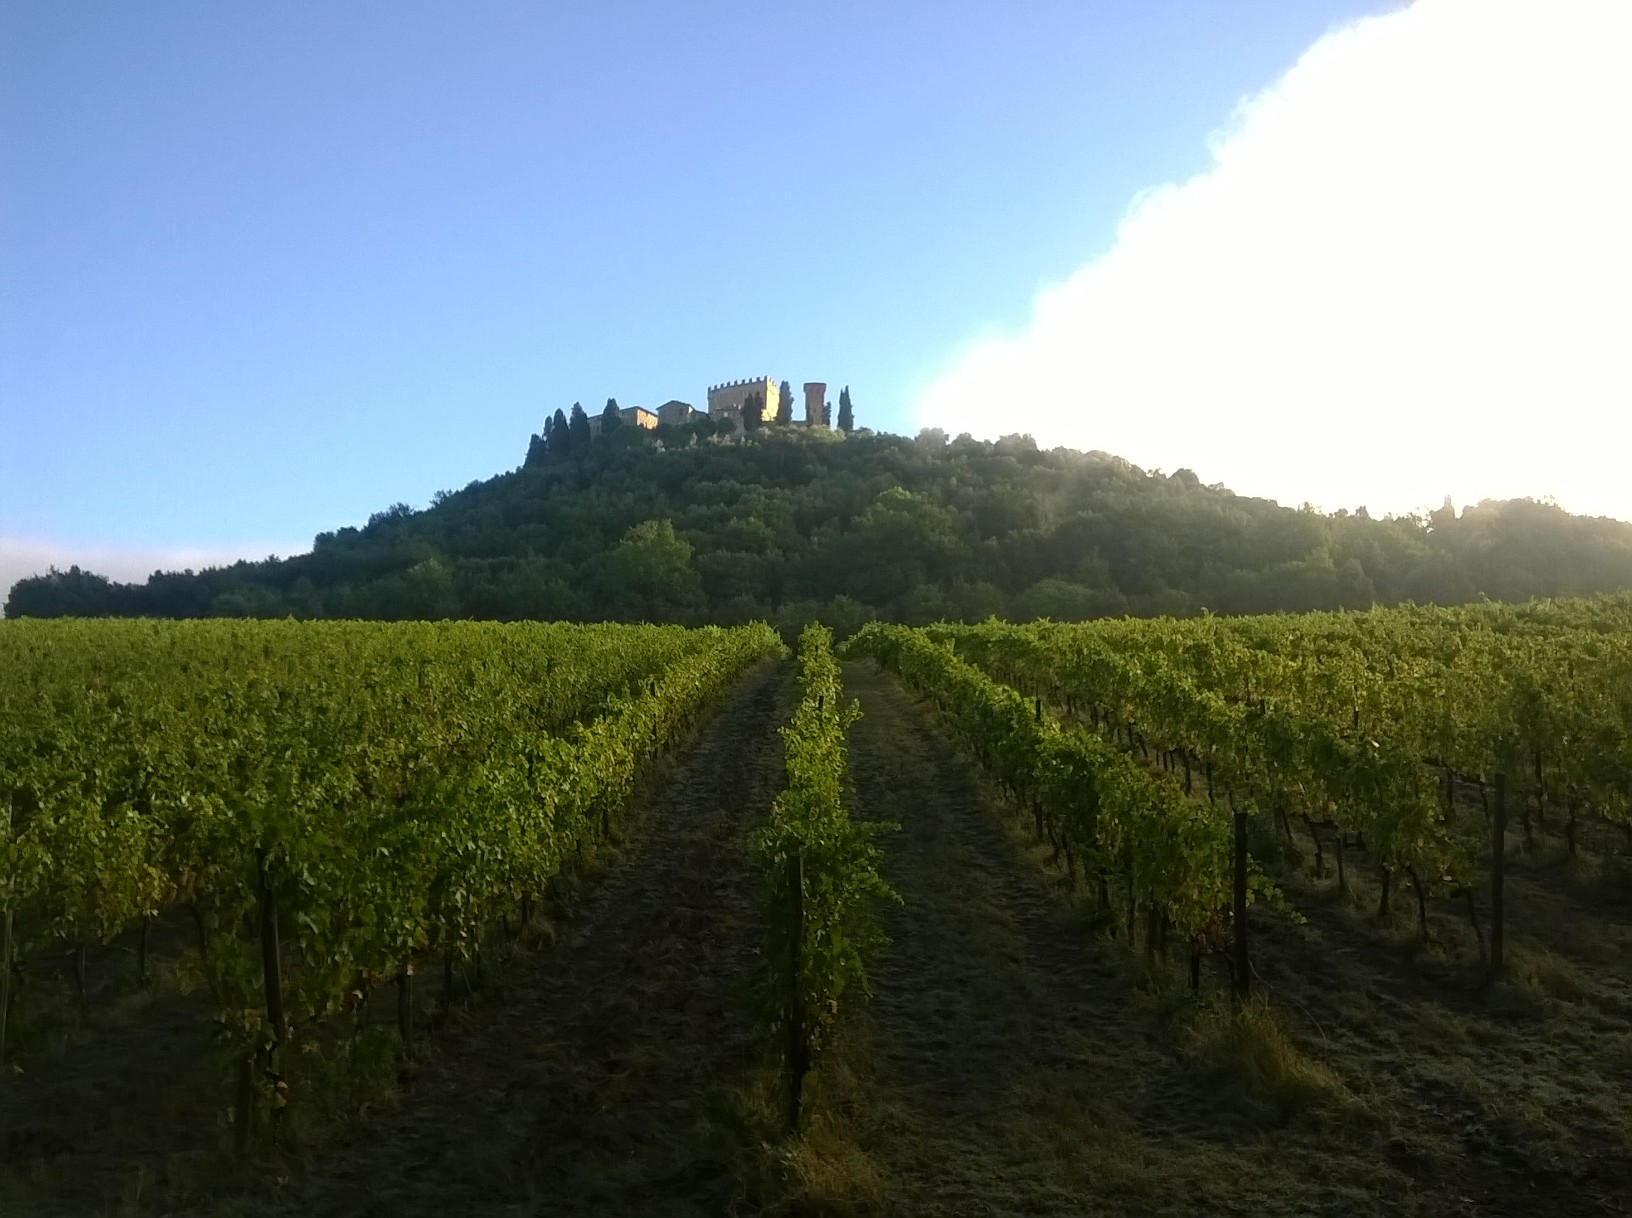 vigna vecchia castello